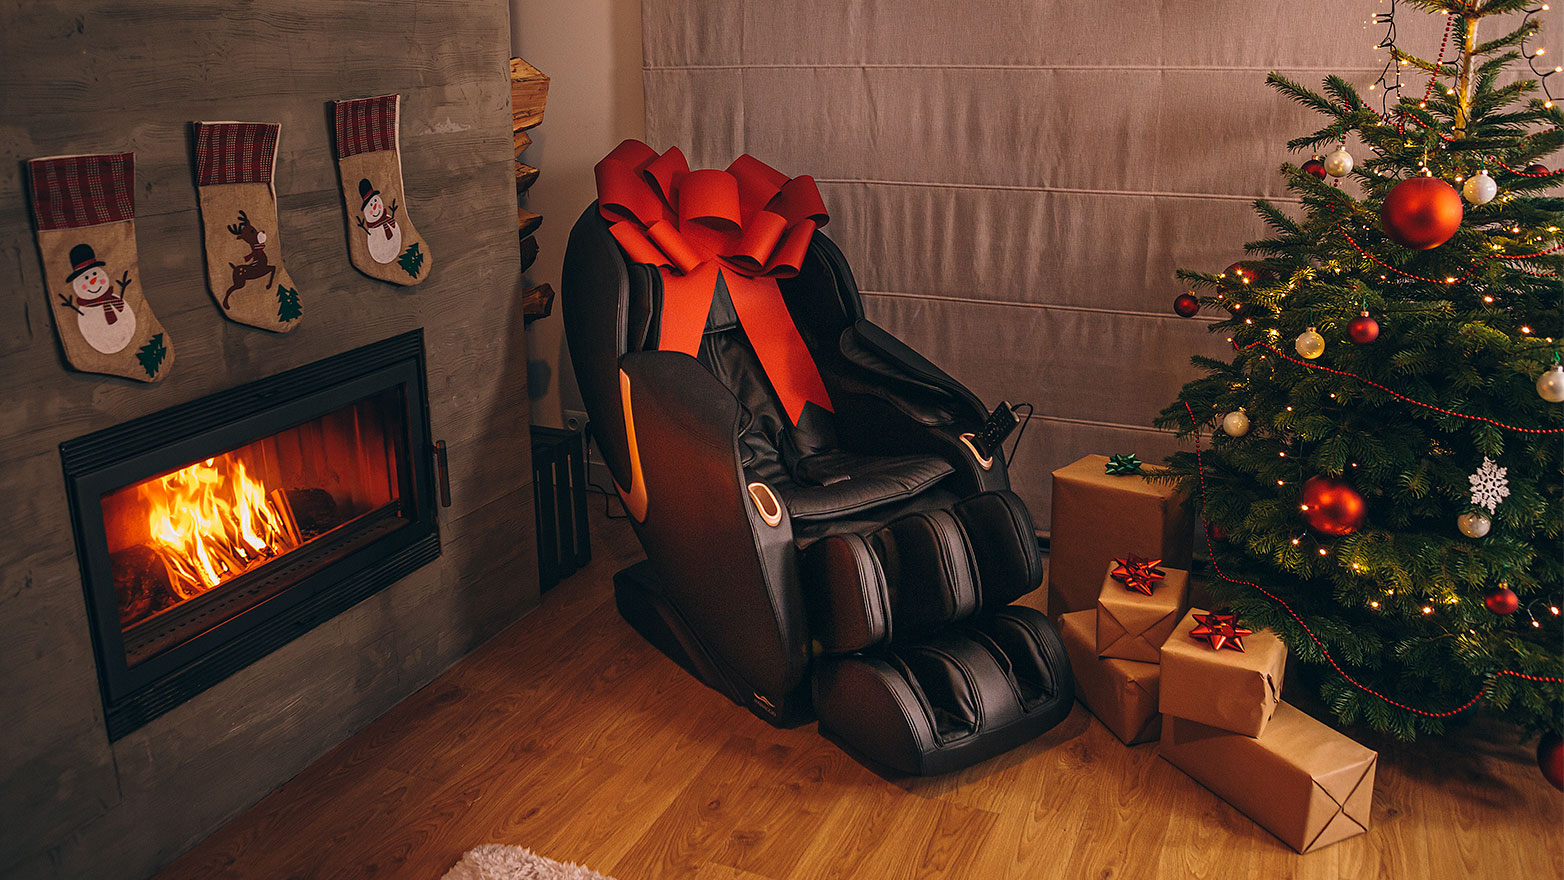 Fotel masujący jako prezent na Święta - Rest Lords Fotele Masujące